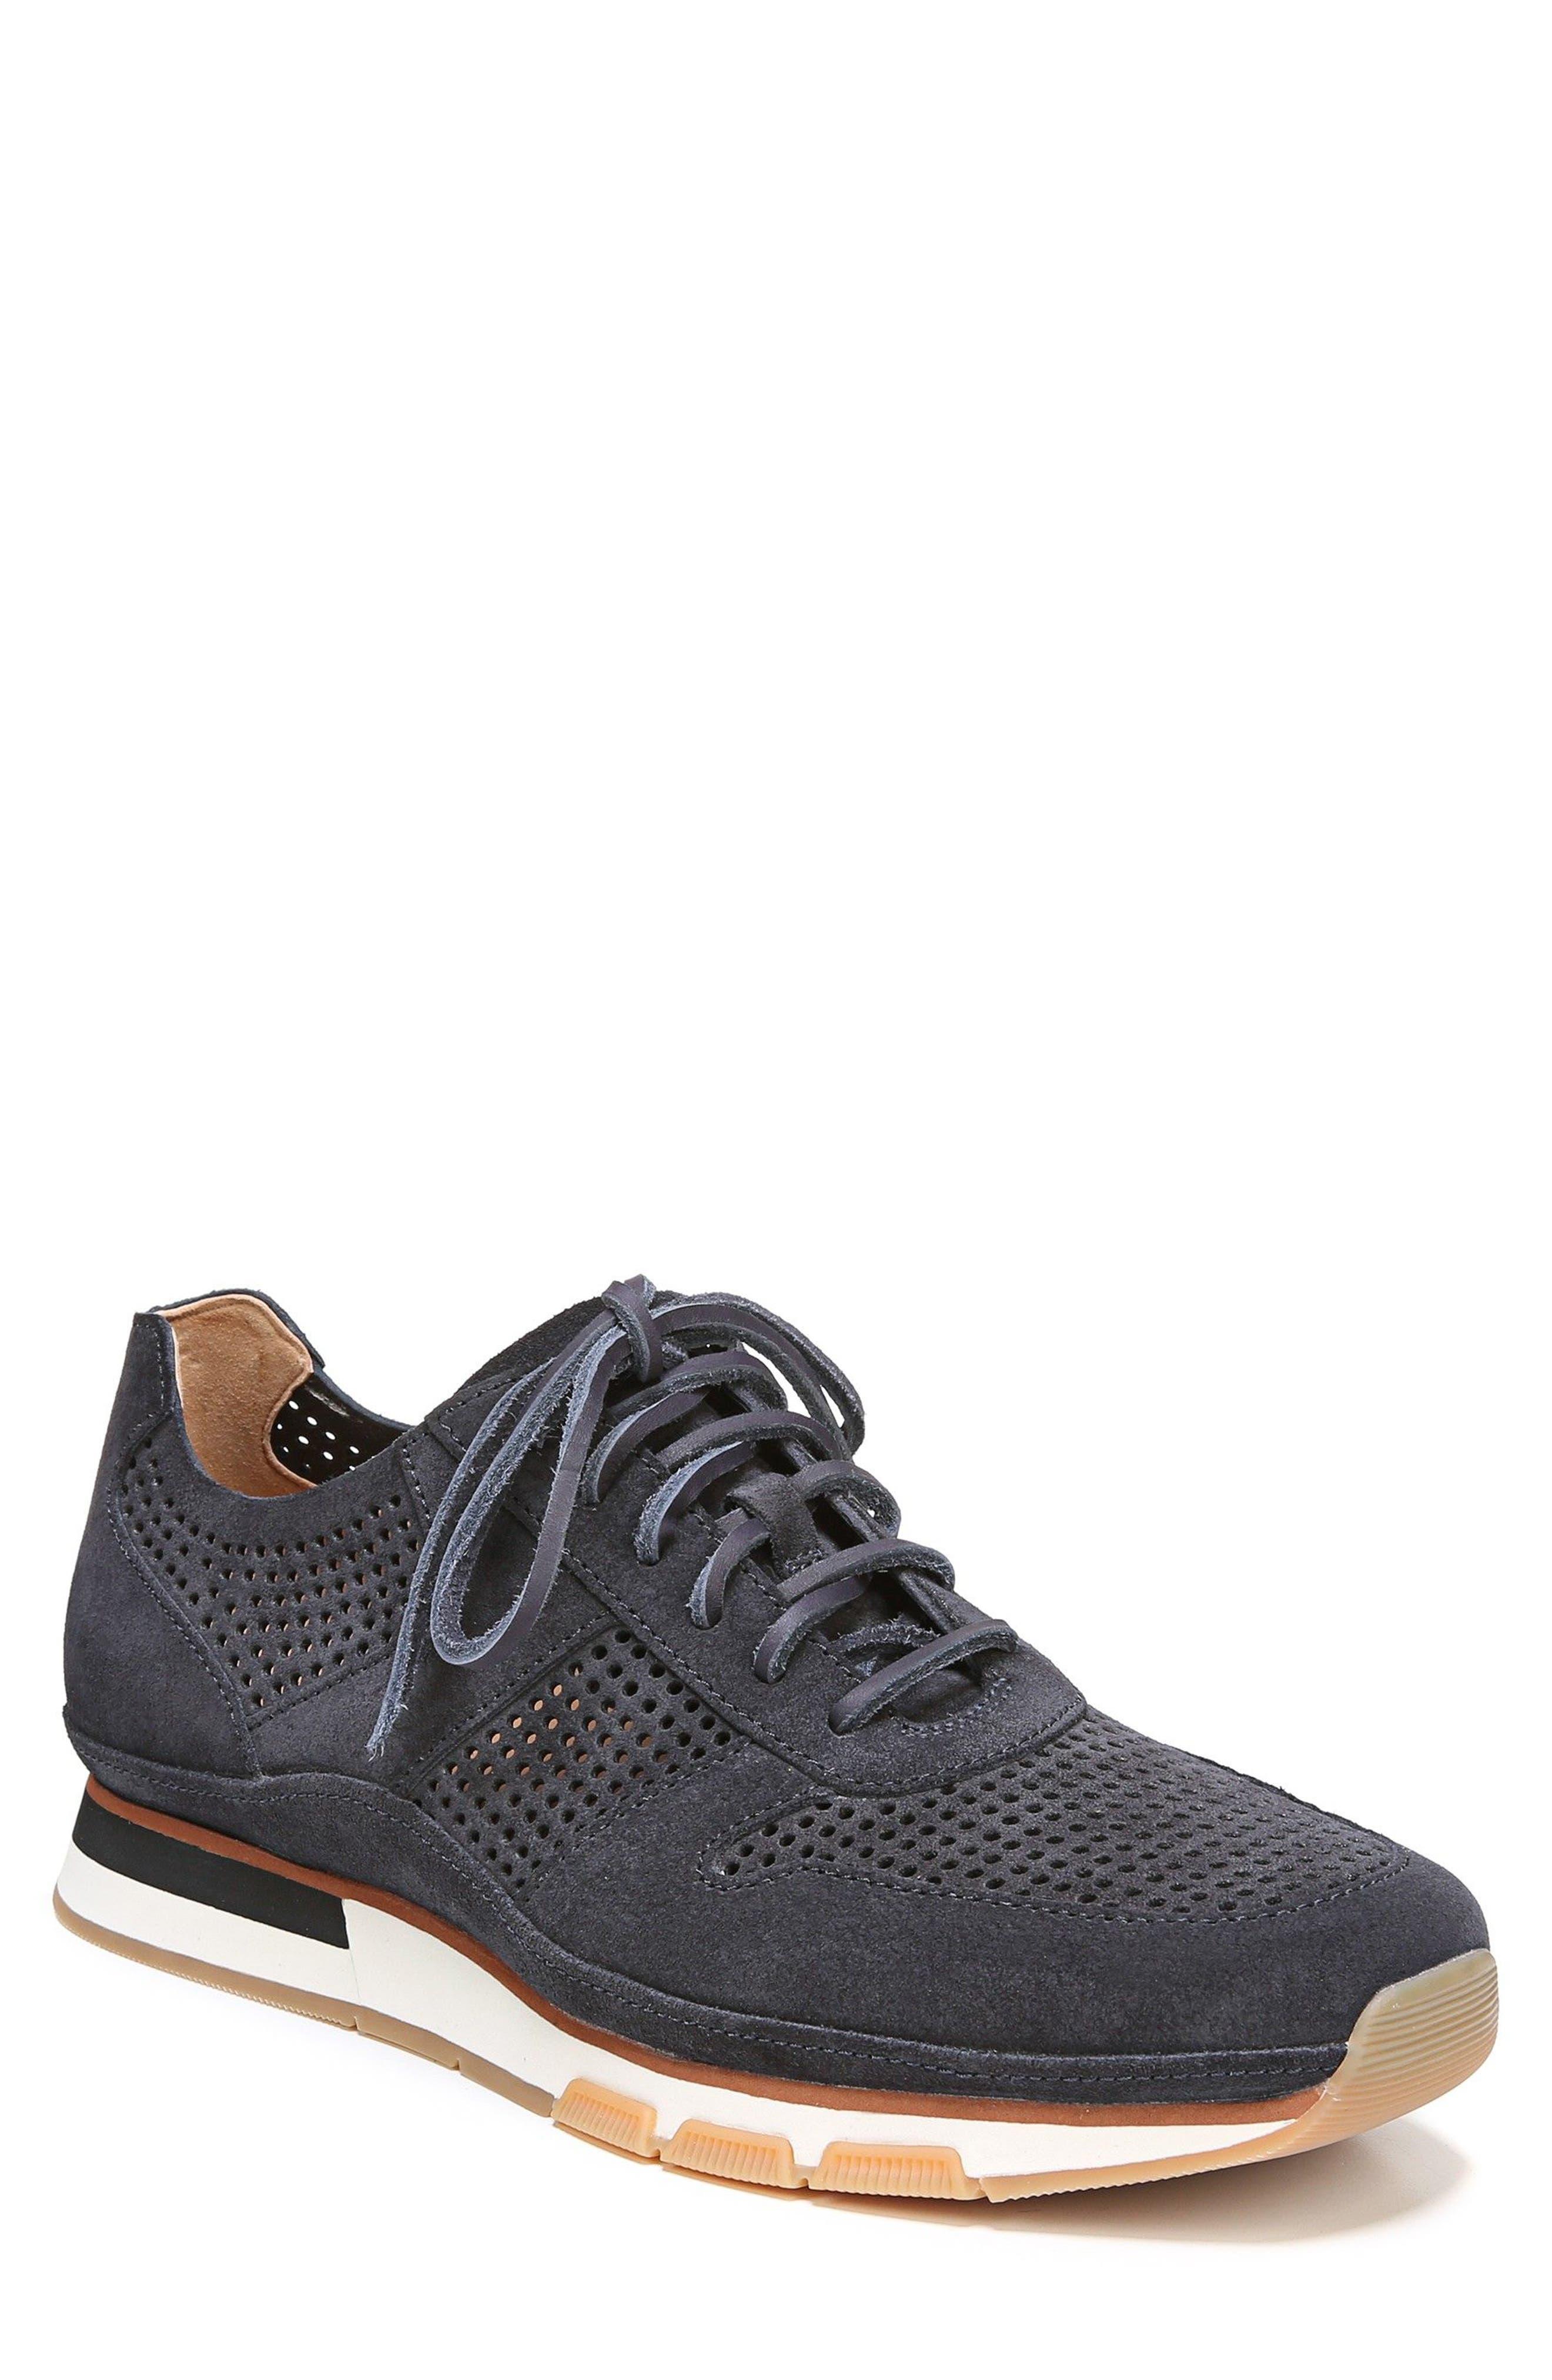 Larson Perforated Sneaker,                         Main,                         color, COASTAL